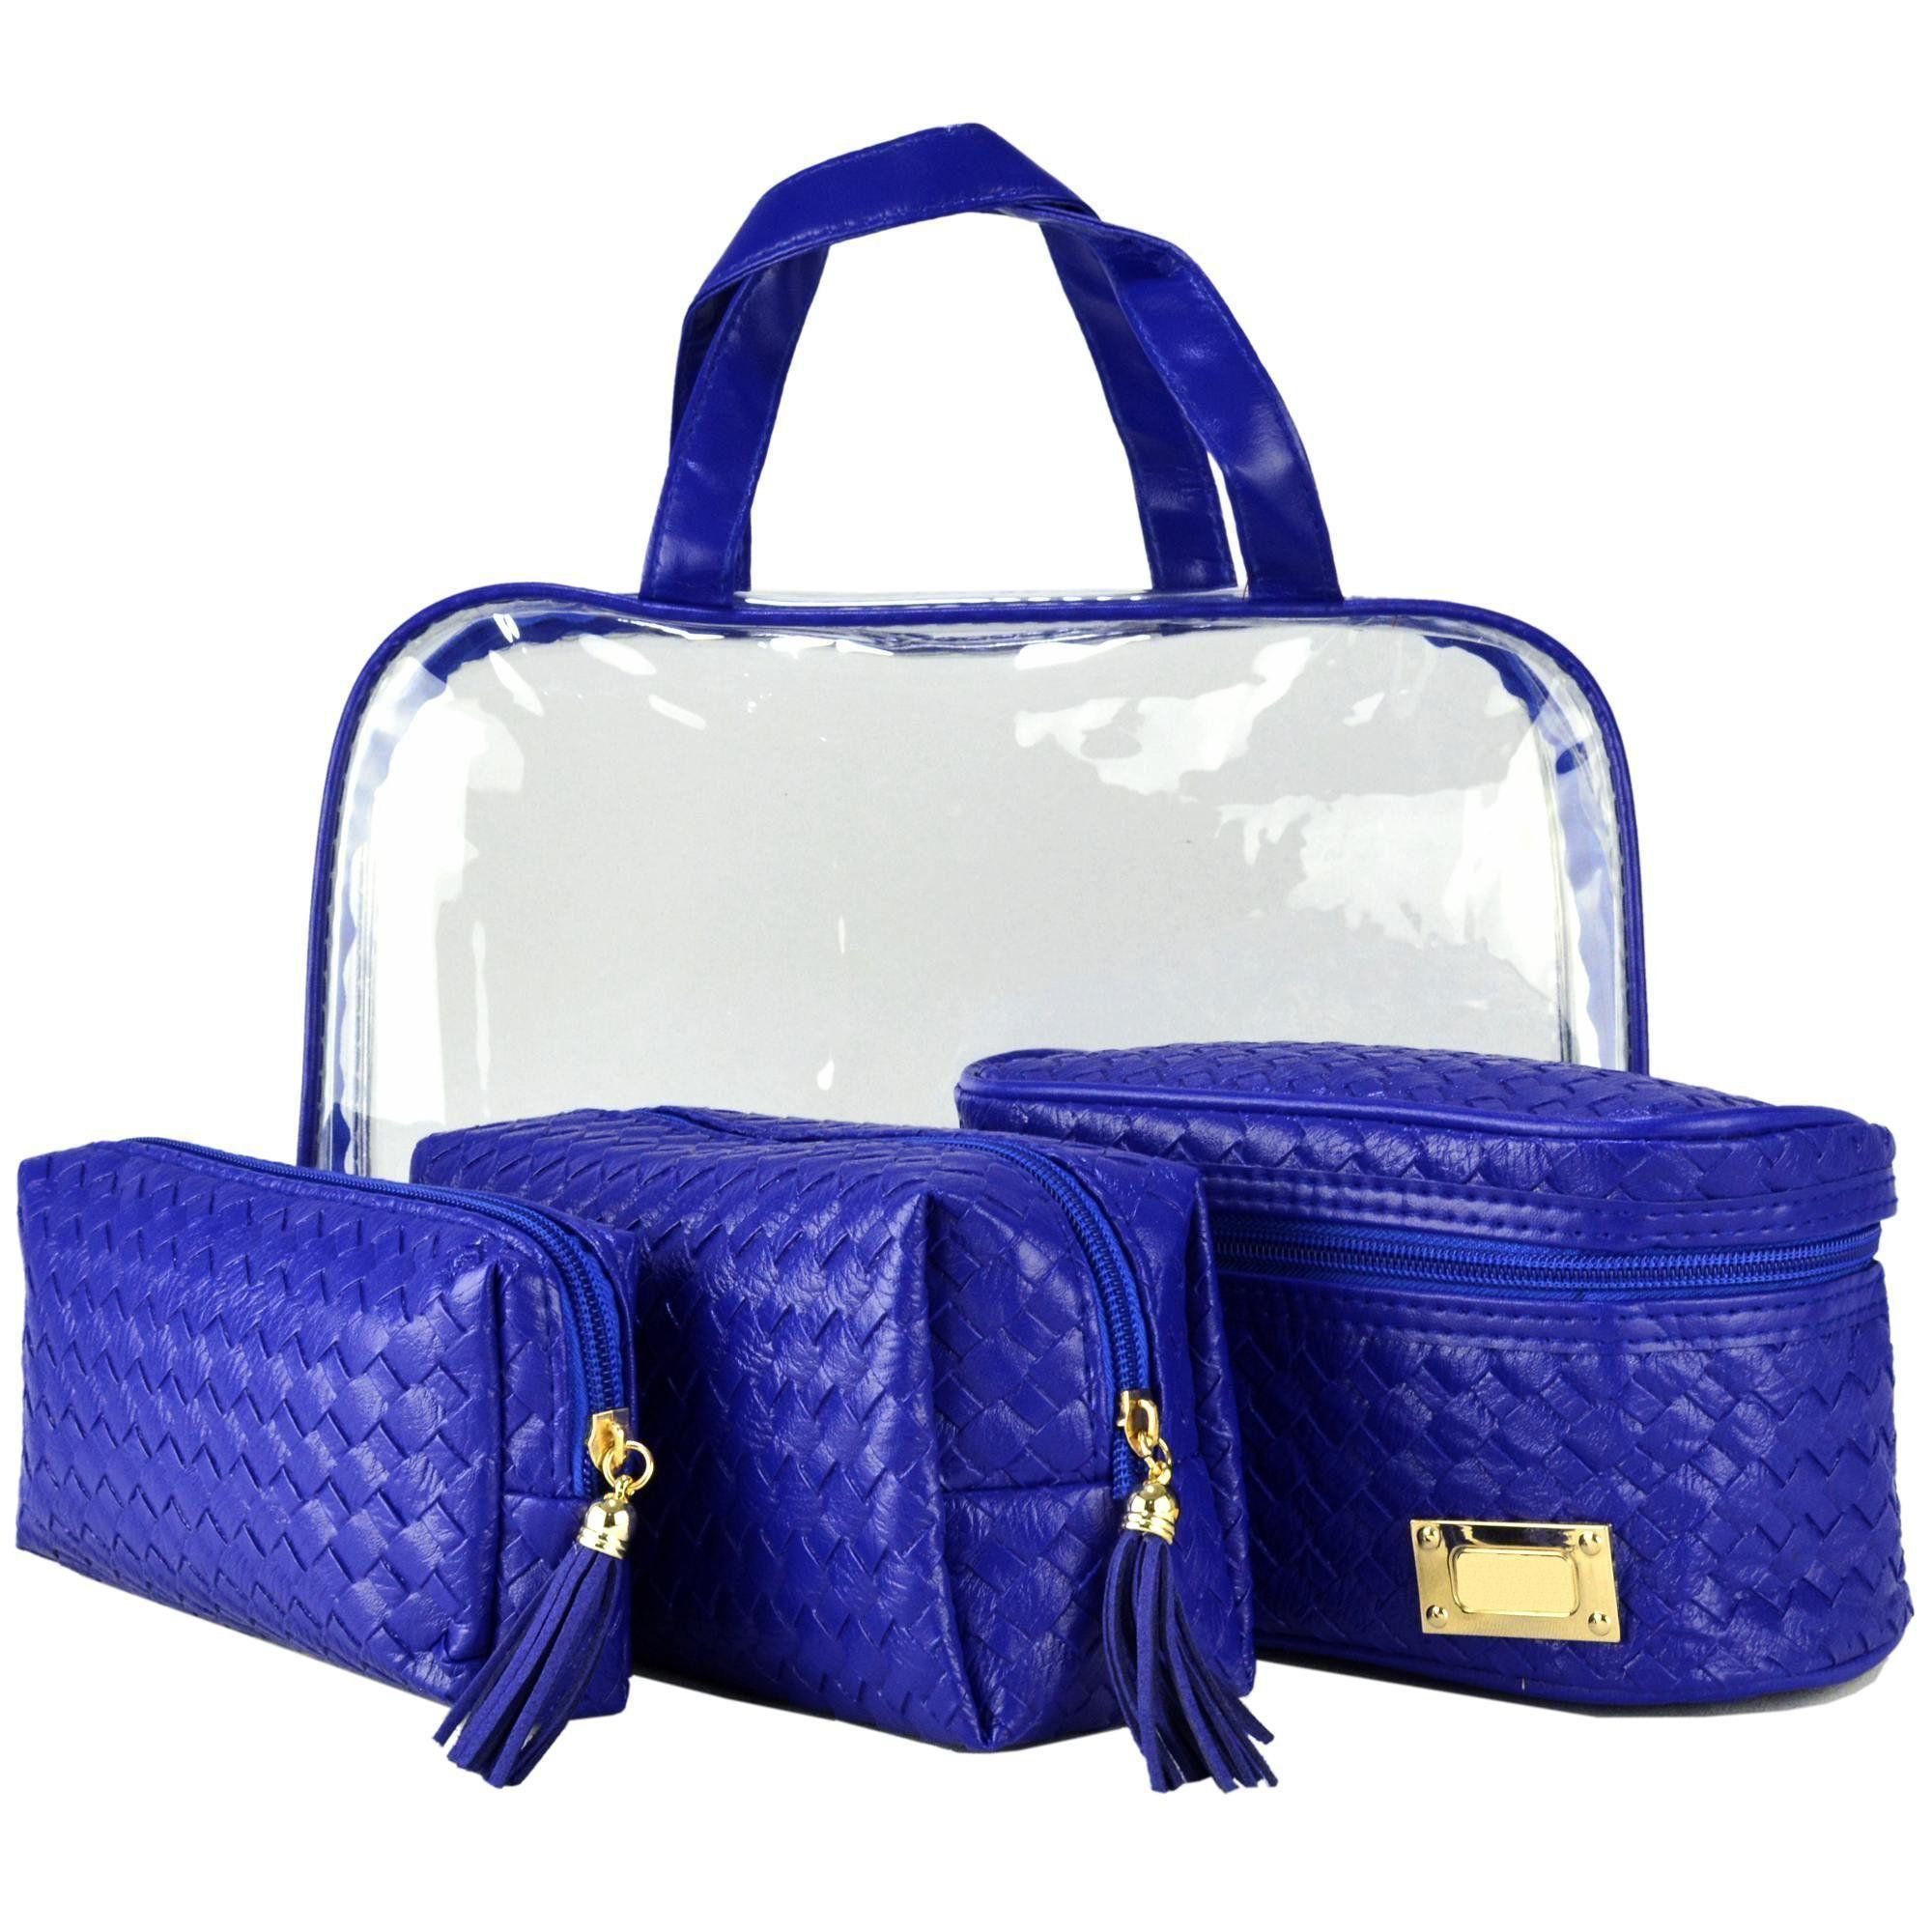 Frasqueiras Necessaire Feminina Luxo Azul Kit 4 Peças CBRN08186